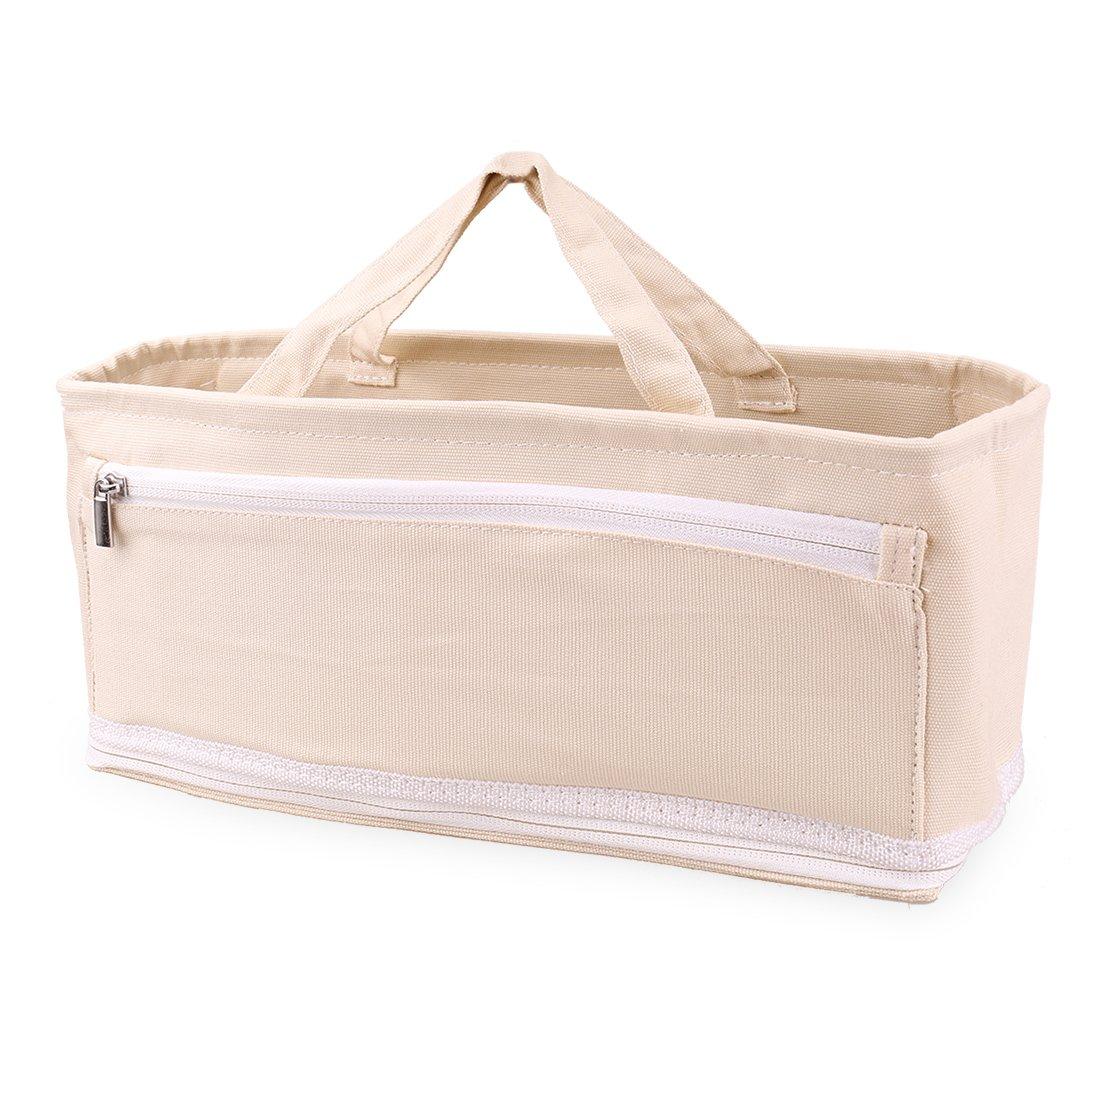 Ava & Kings Handbag Purse Organizer Insert Multipocket Large Tote Bag Shaper | Fits XL Handbags, Diaper Bags, Backpack | Organize & Structure Any Bag - Solid Beige